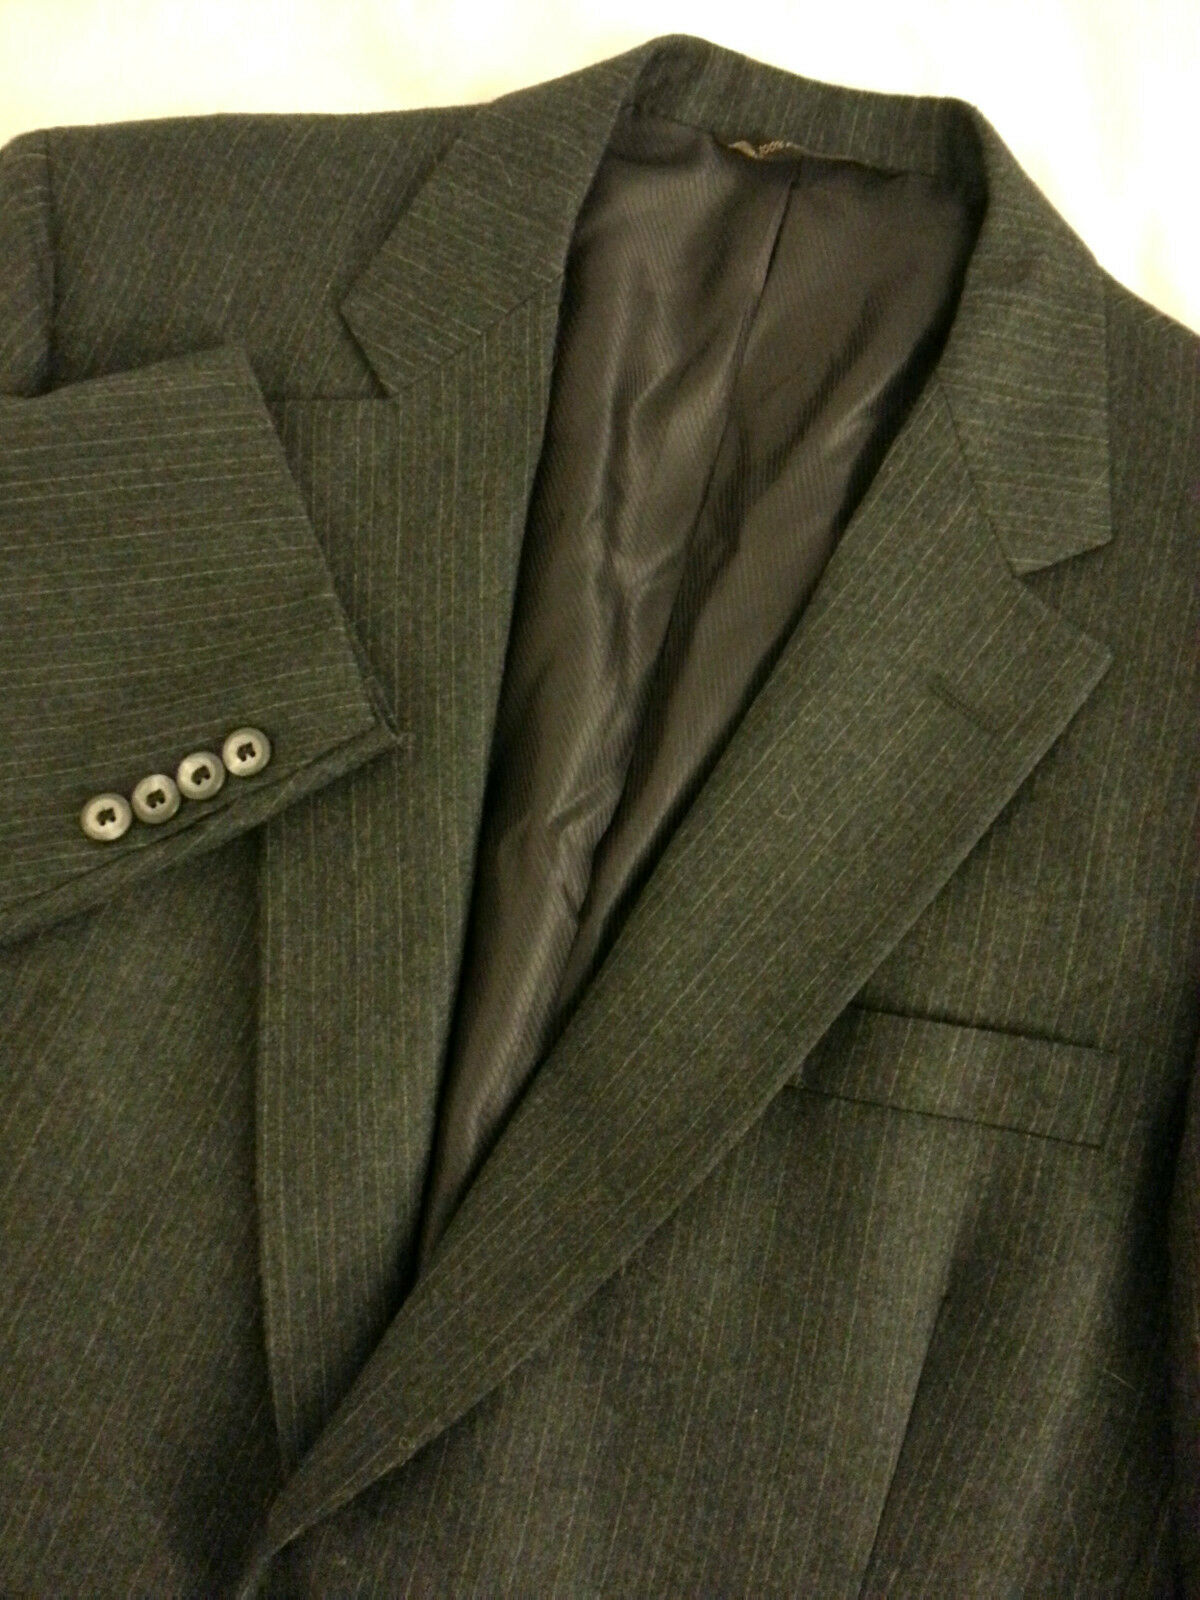 HART SCHAFFNER & MARX Men's 2 Button Blazer Sport Coat Charcoal Pinstripe Sz 42R